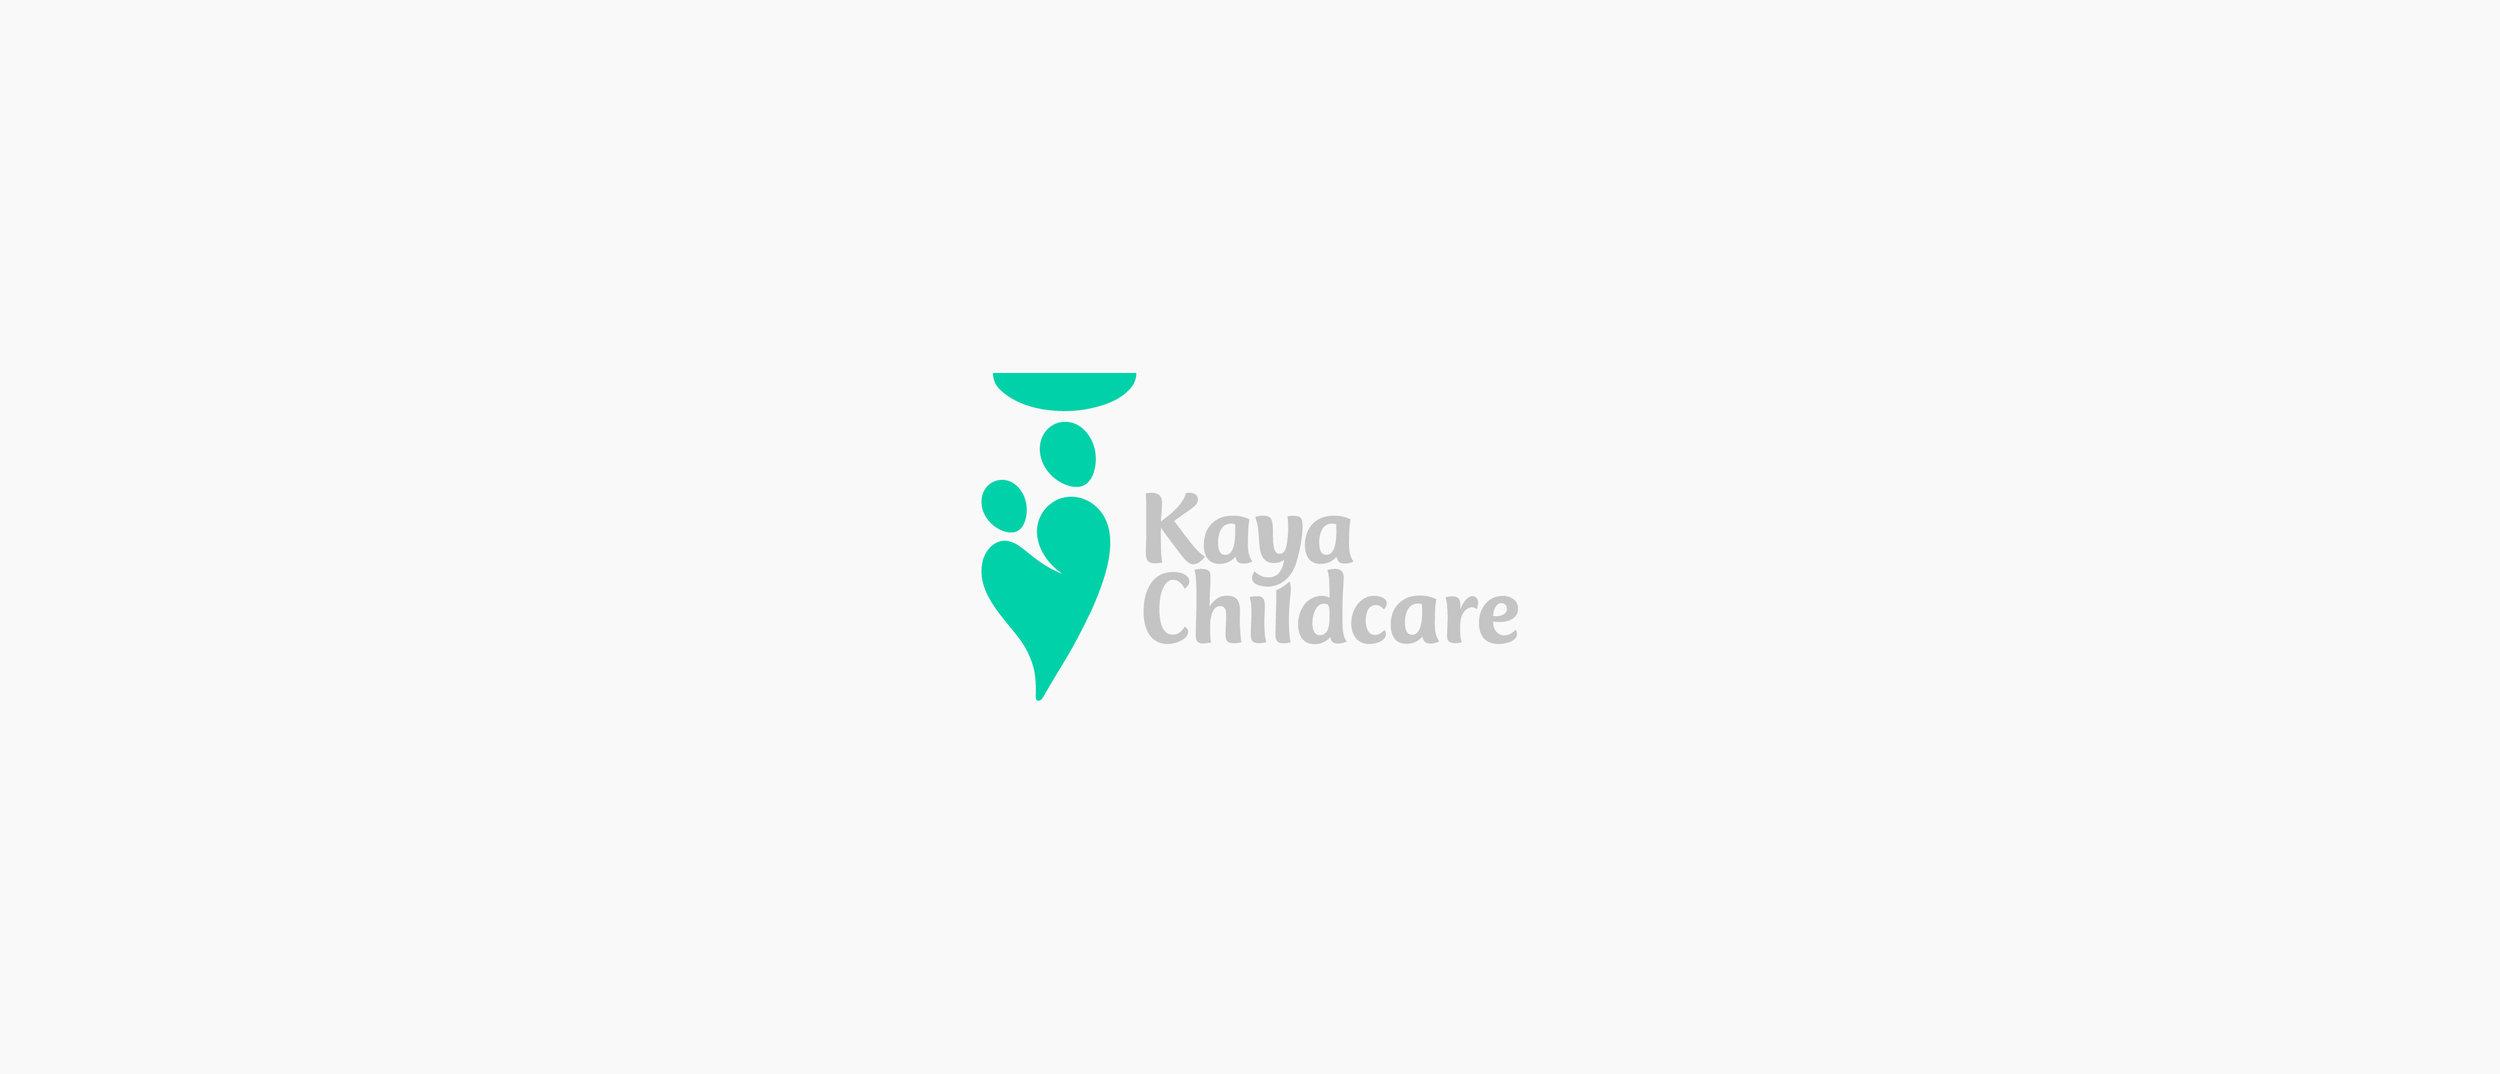 Kaya ChildCare | Toddler Day Care Center | 2016